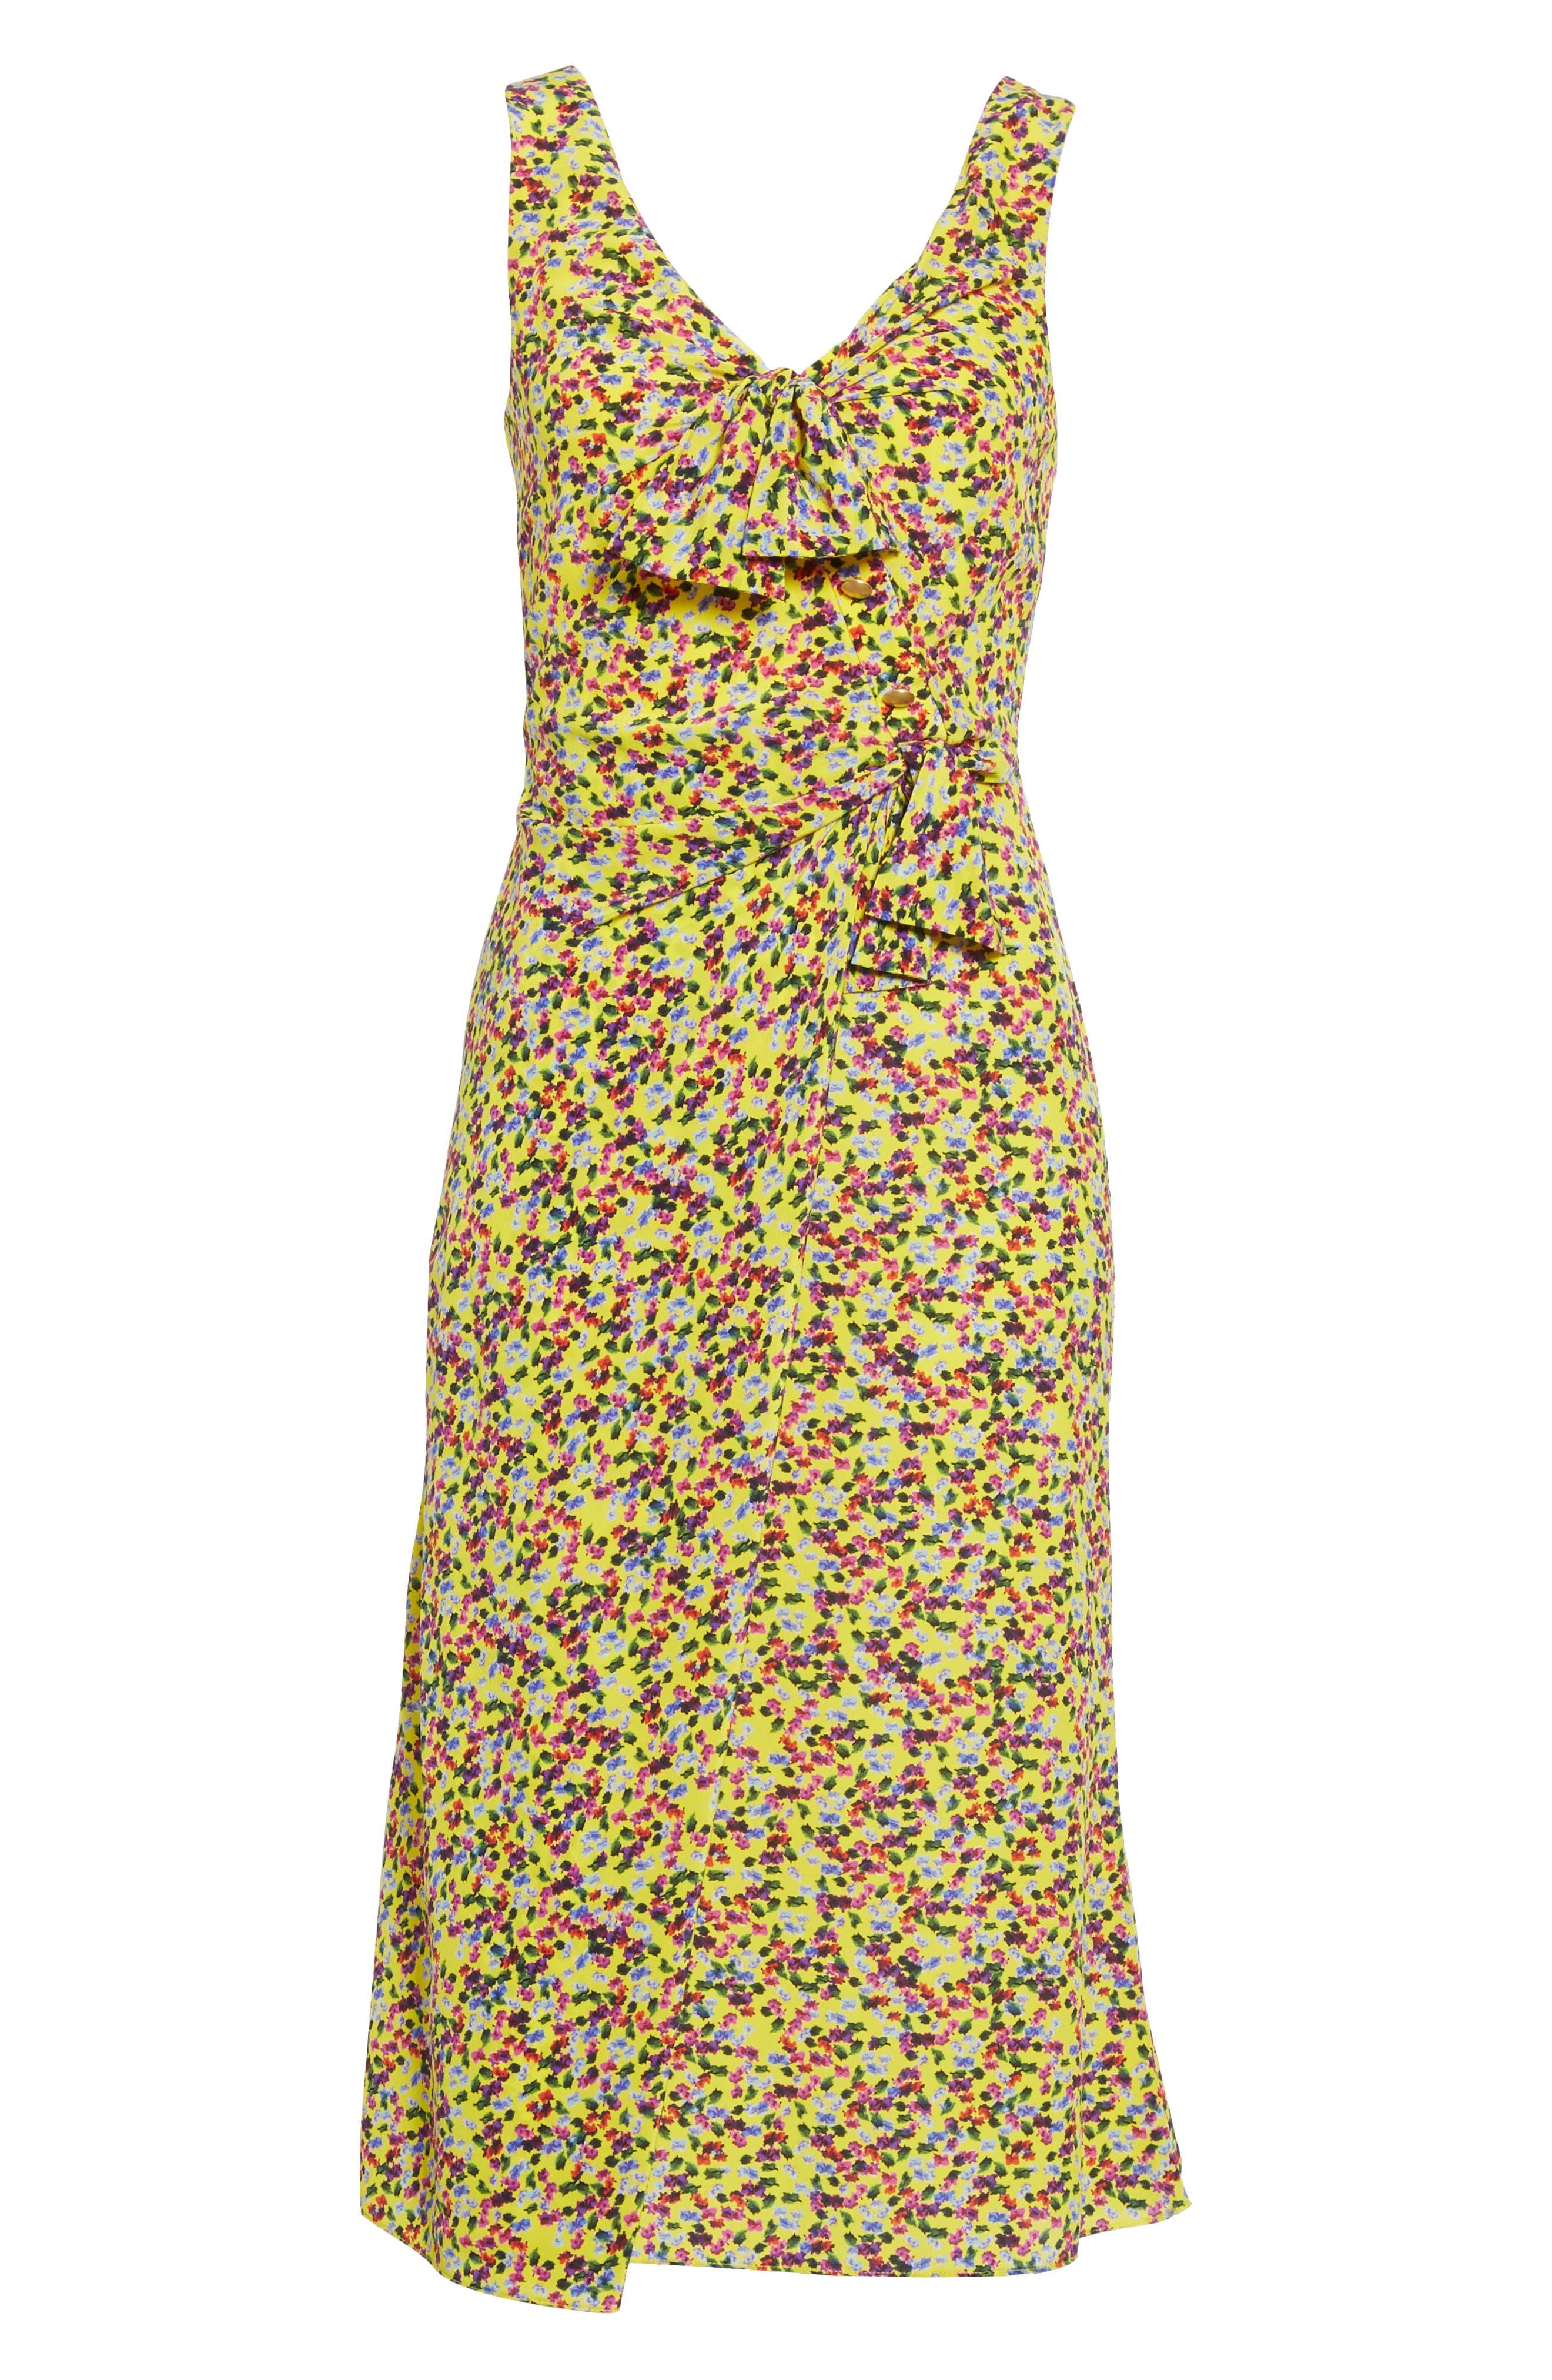 SALONI, Penelope Floral Print Silk Midi Dress, Alternate thumbnail 6, color, YELLOW GARDENIA